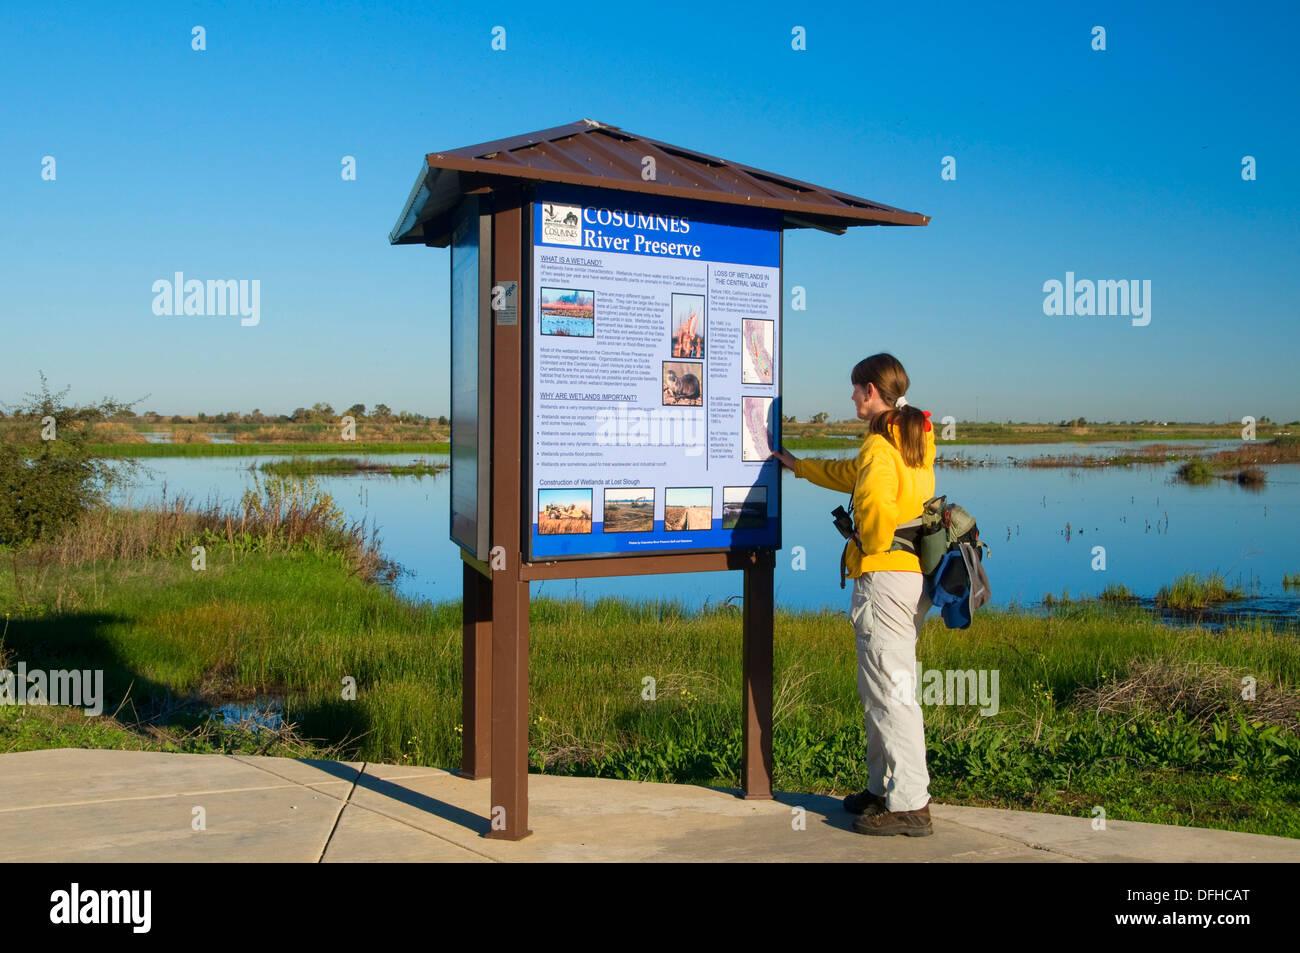 Slough Feuchtgebiete gehen Kiosk, Cosumnes River Preserve, CA verloren Stockbild